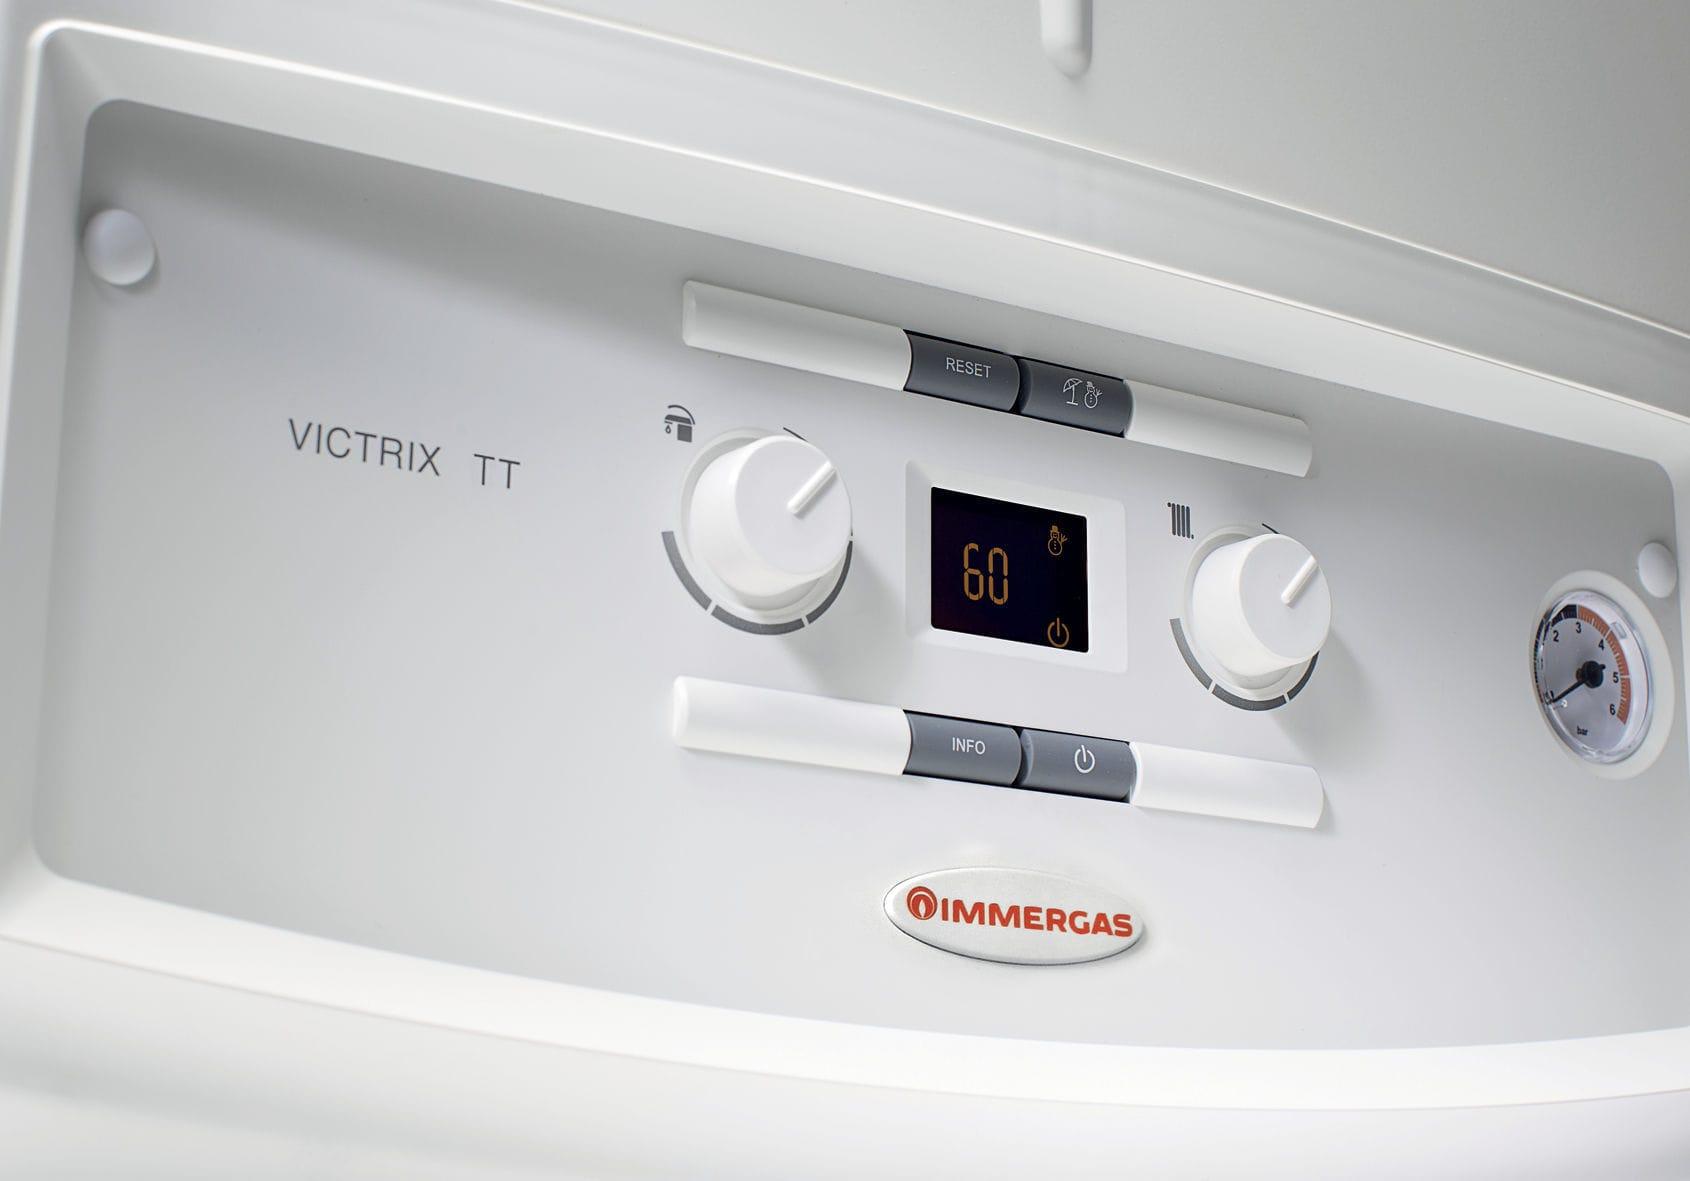 Immergas Victrix 24 TT 1 E Kombi